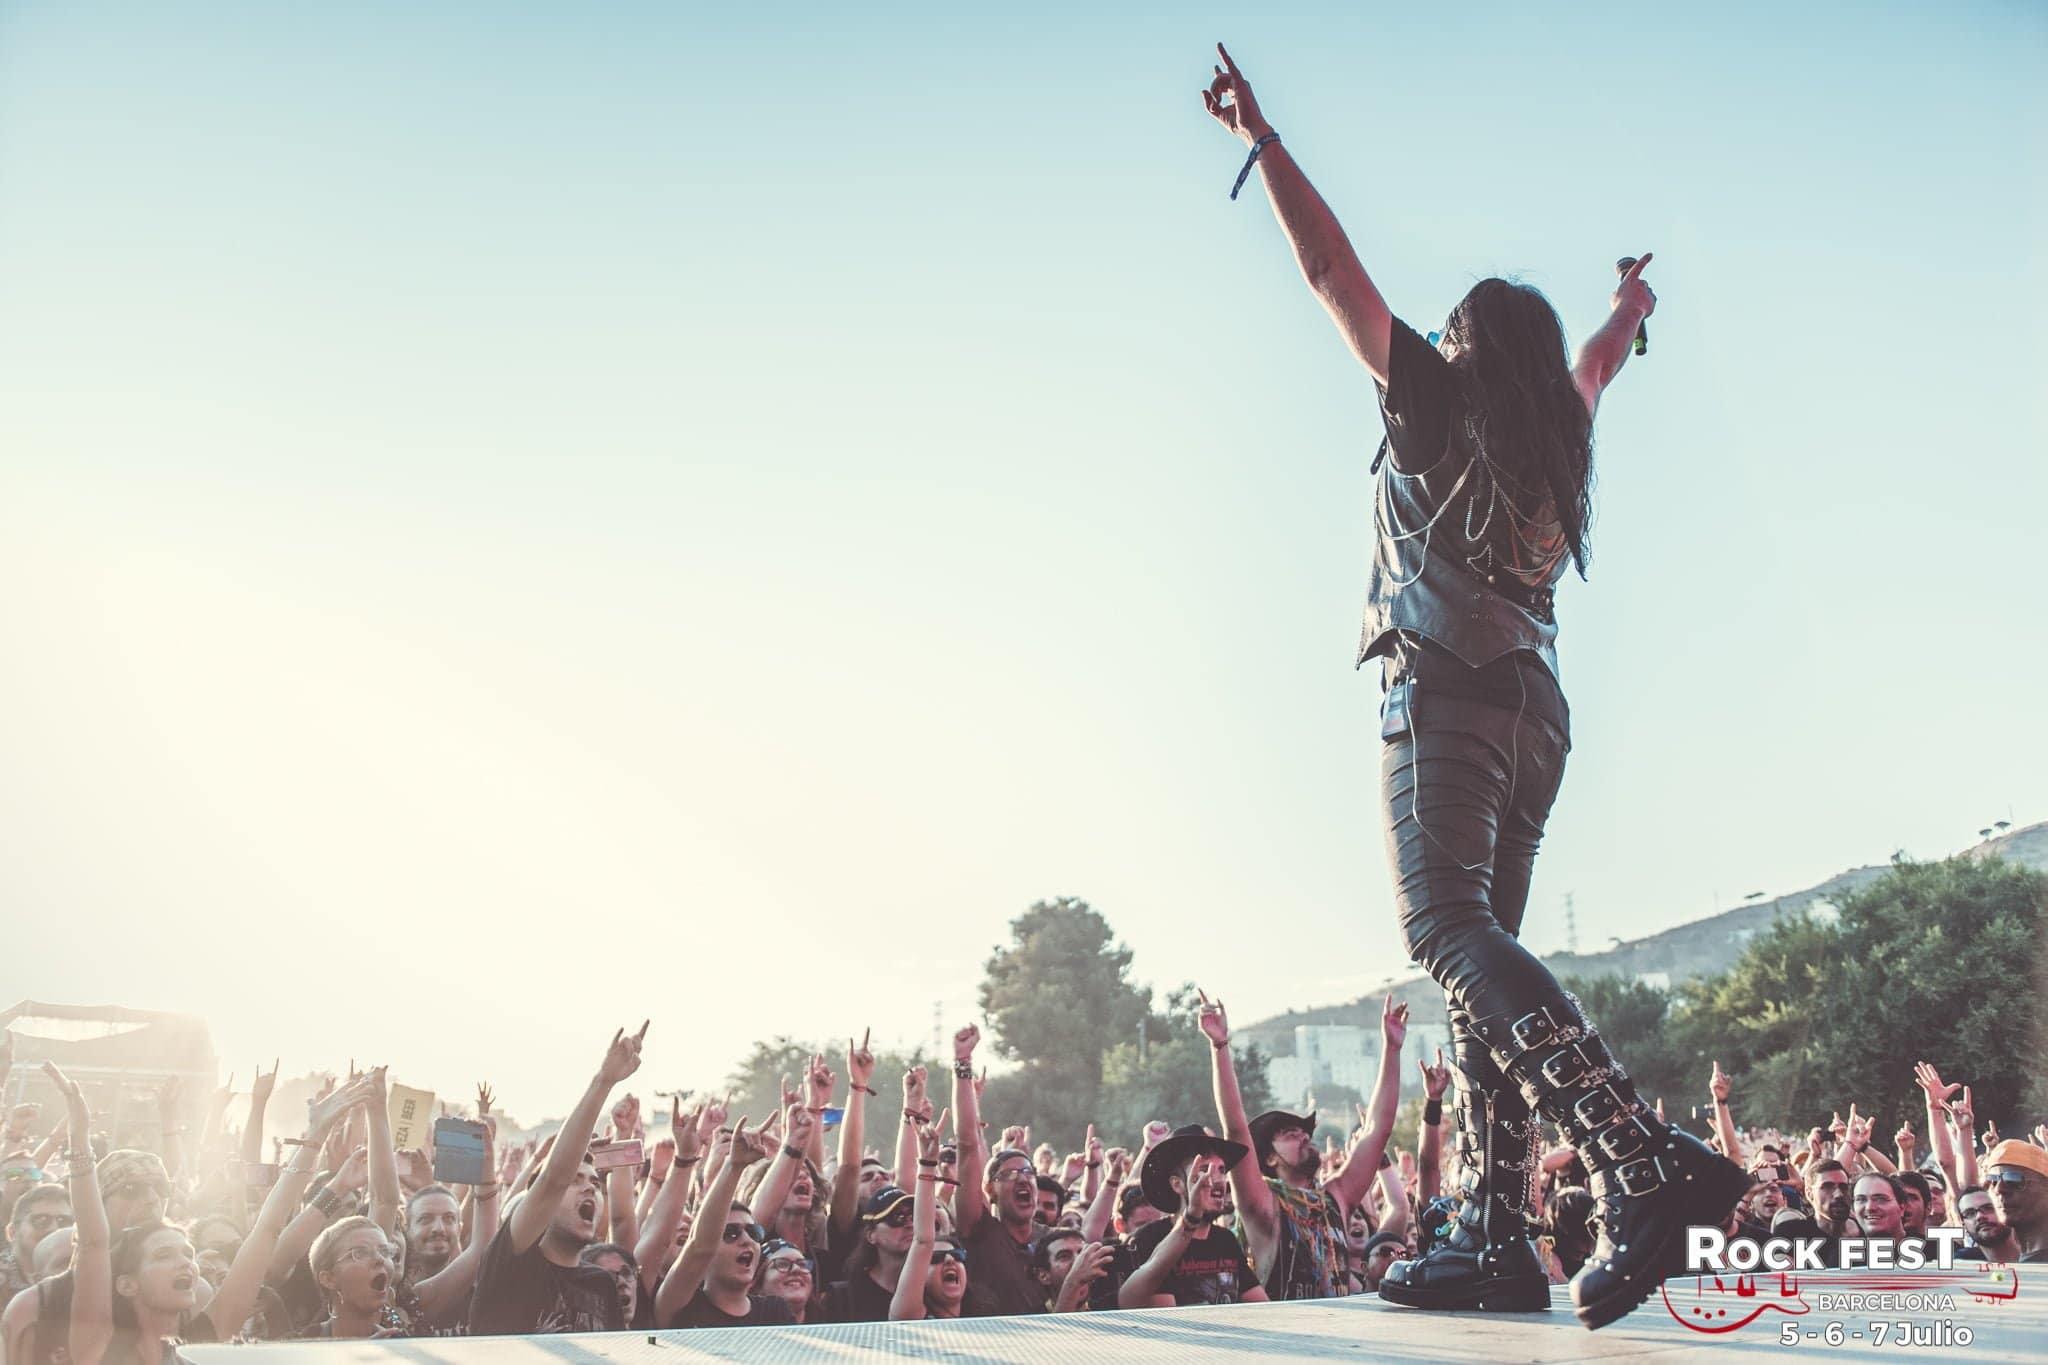 Mago de Oz Rock Fest Barcelona 2018